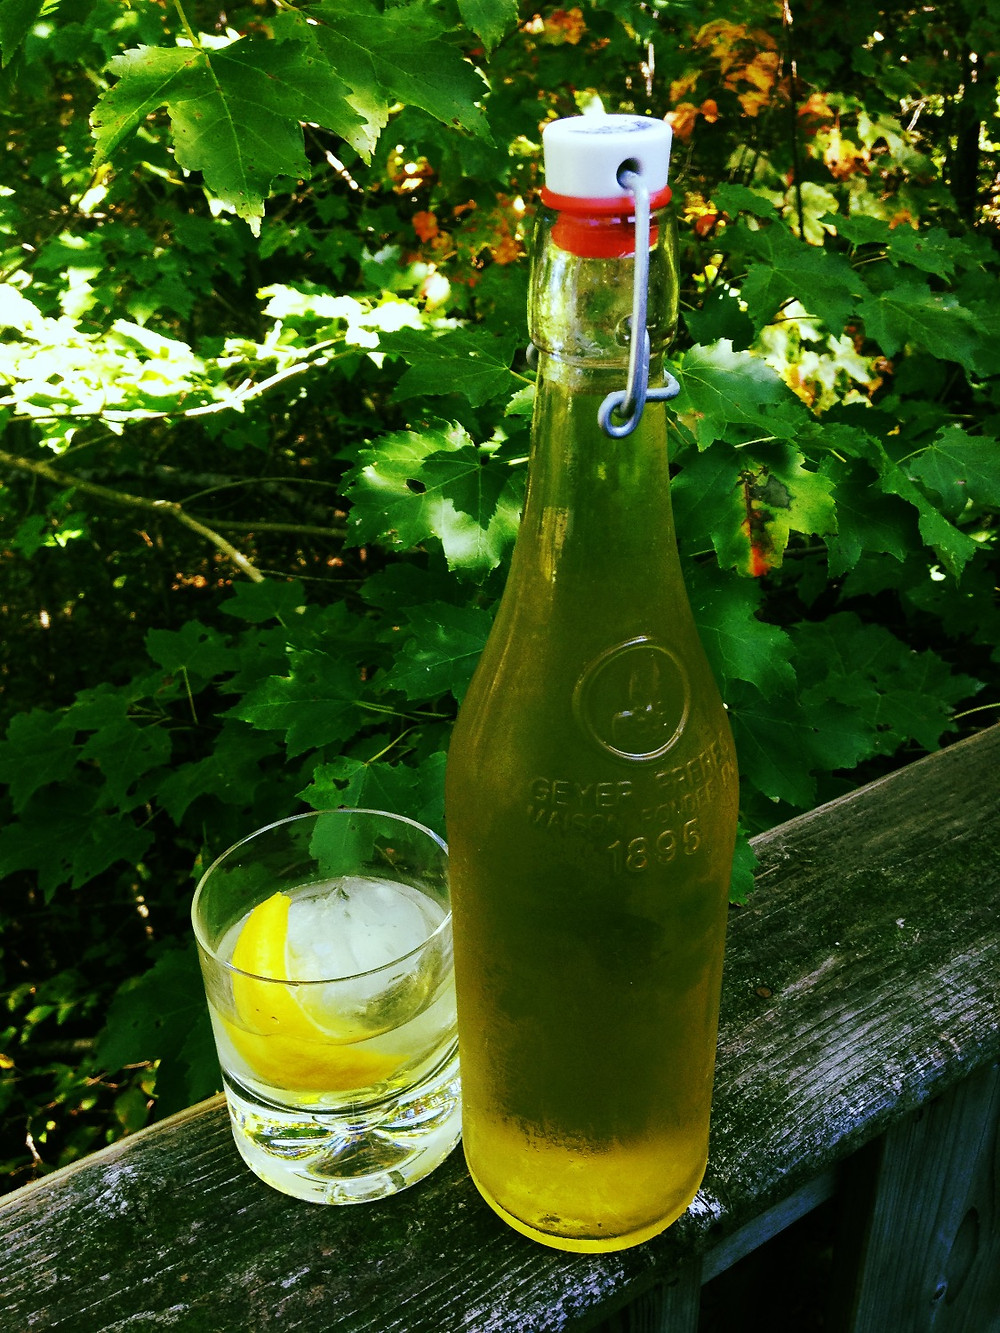 monkey weddings & summer sapphires limoncello recipe